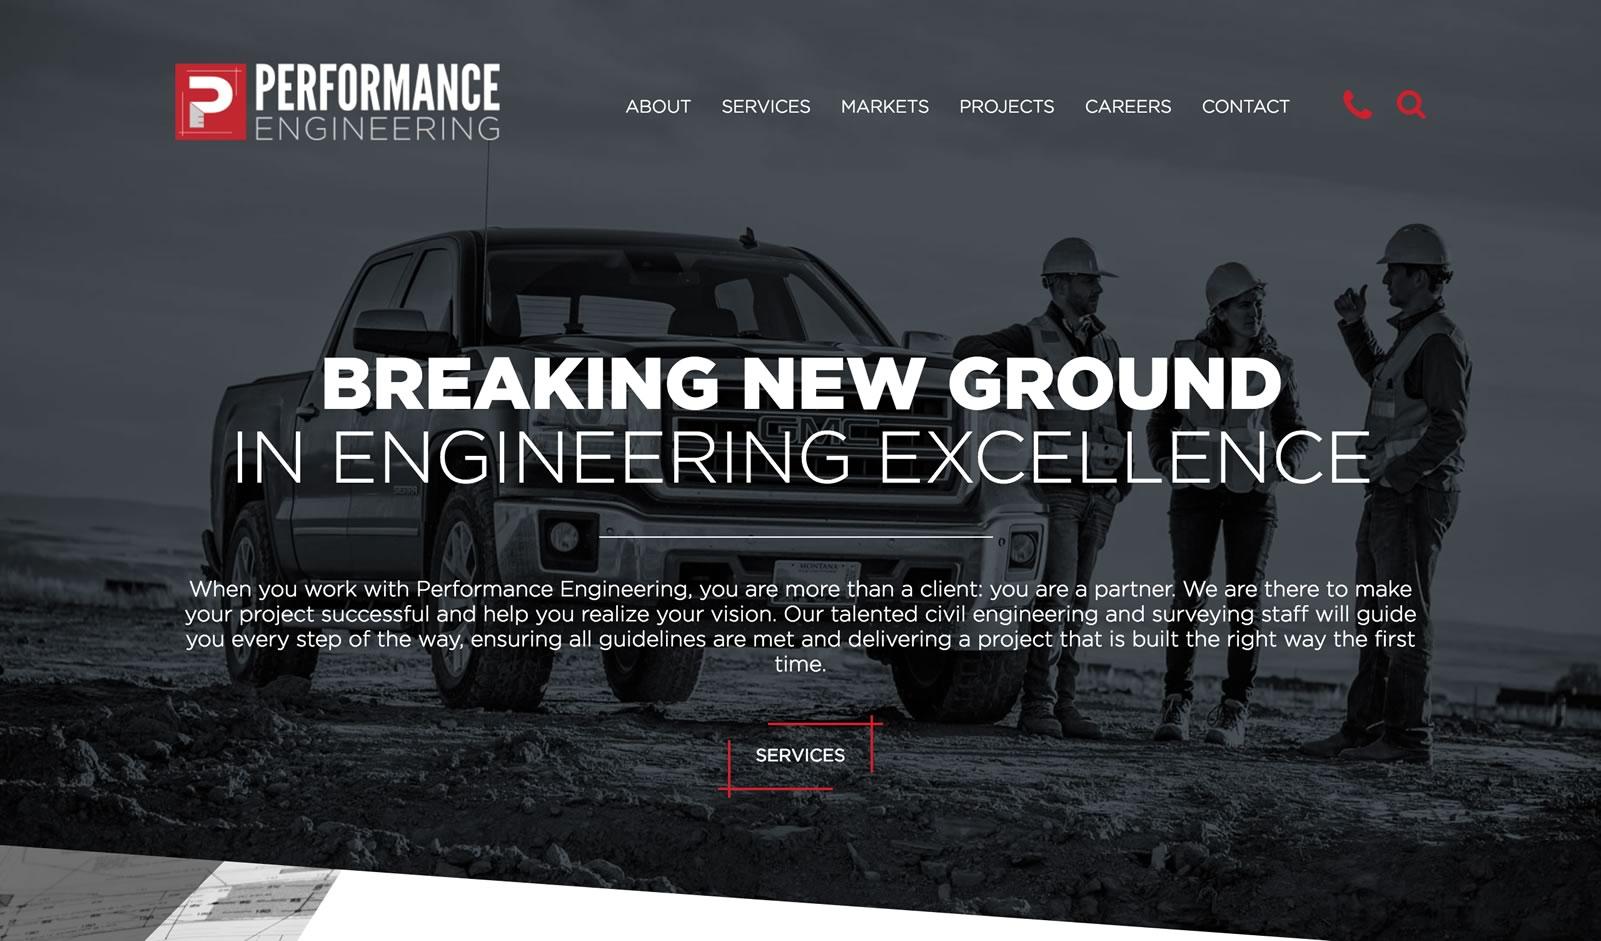 Web Design - Performance Engineering